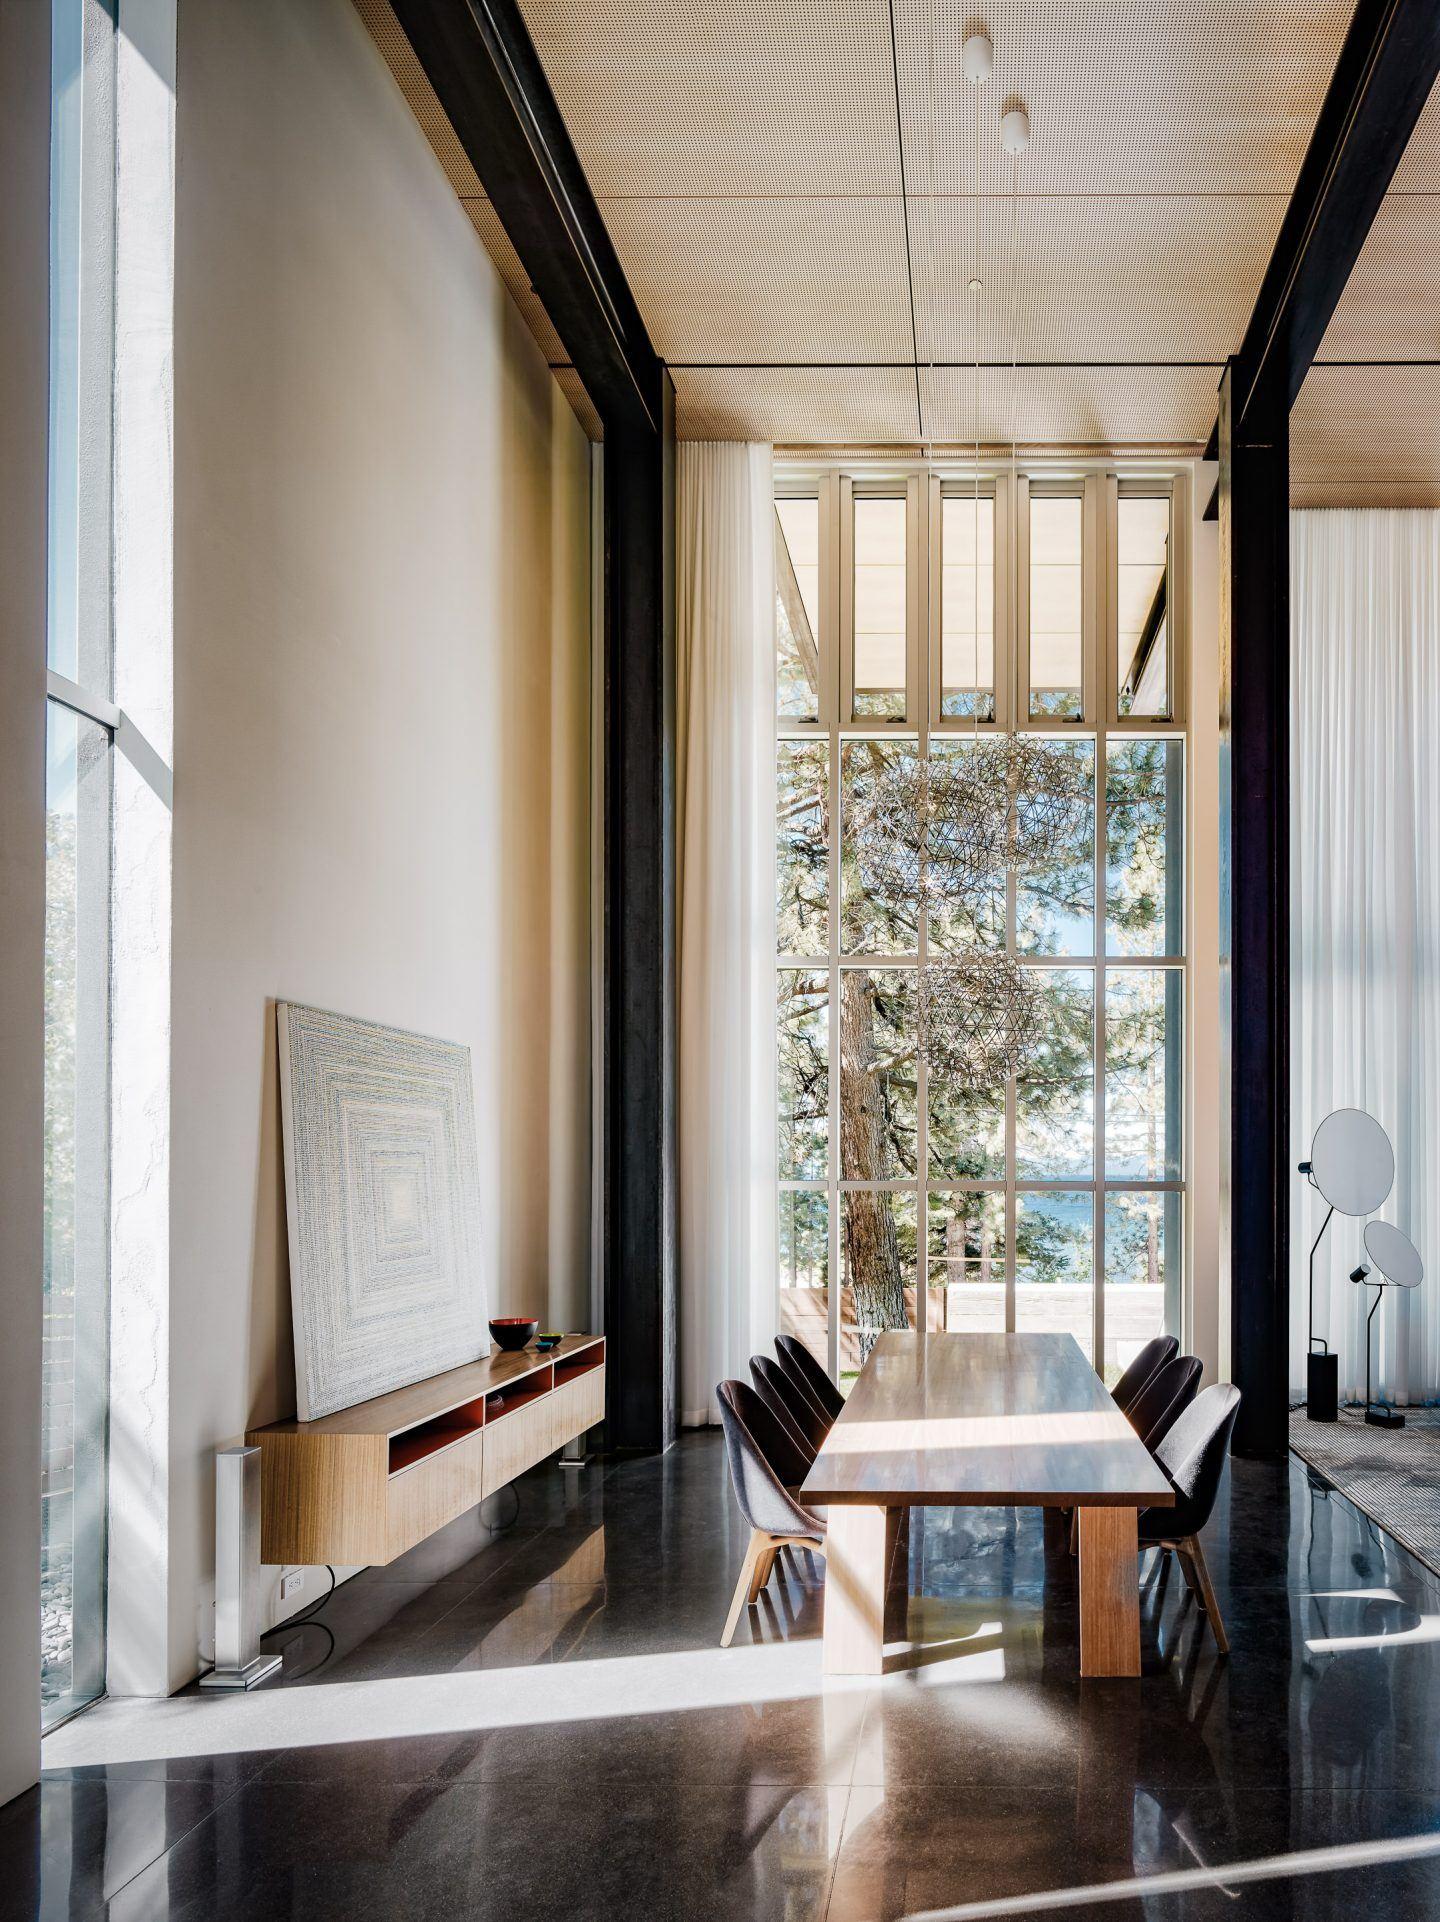 IGNANT-Architecture-Faulkner-Architects-Burnt-Cedar-011